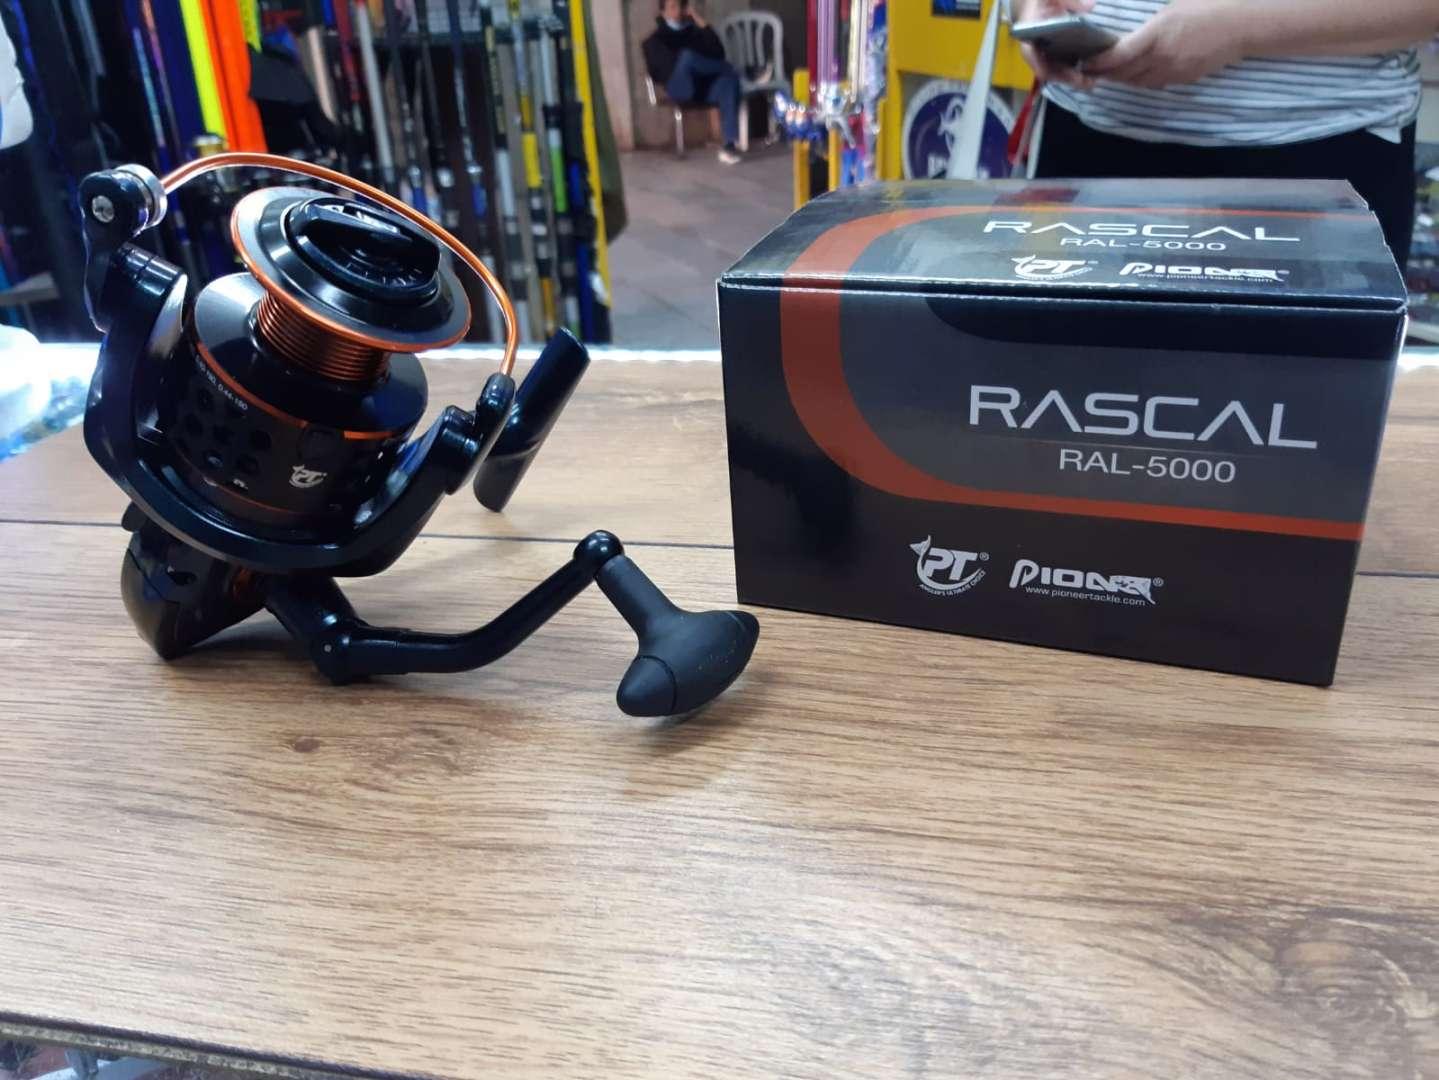 PIONER RASCL RAL-5000